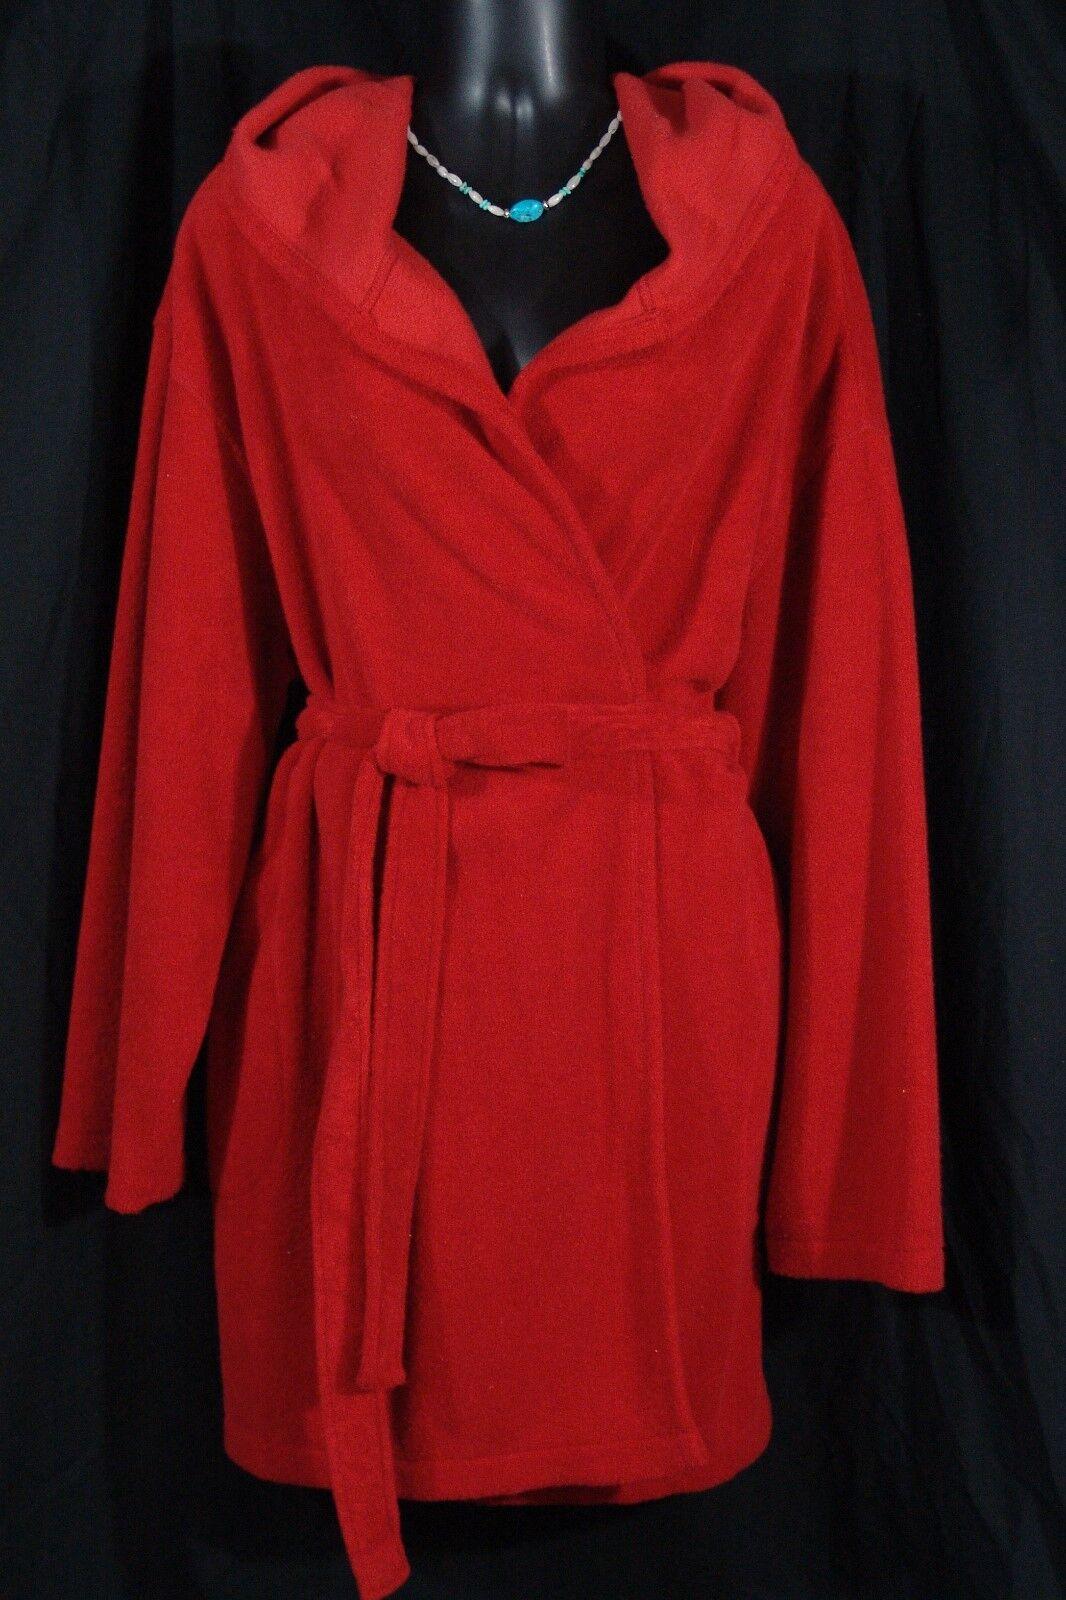 Victoria's Secret Robe M L hoodie (red medium large VS hooded spa wrap)